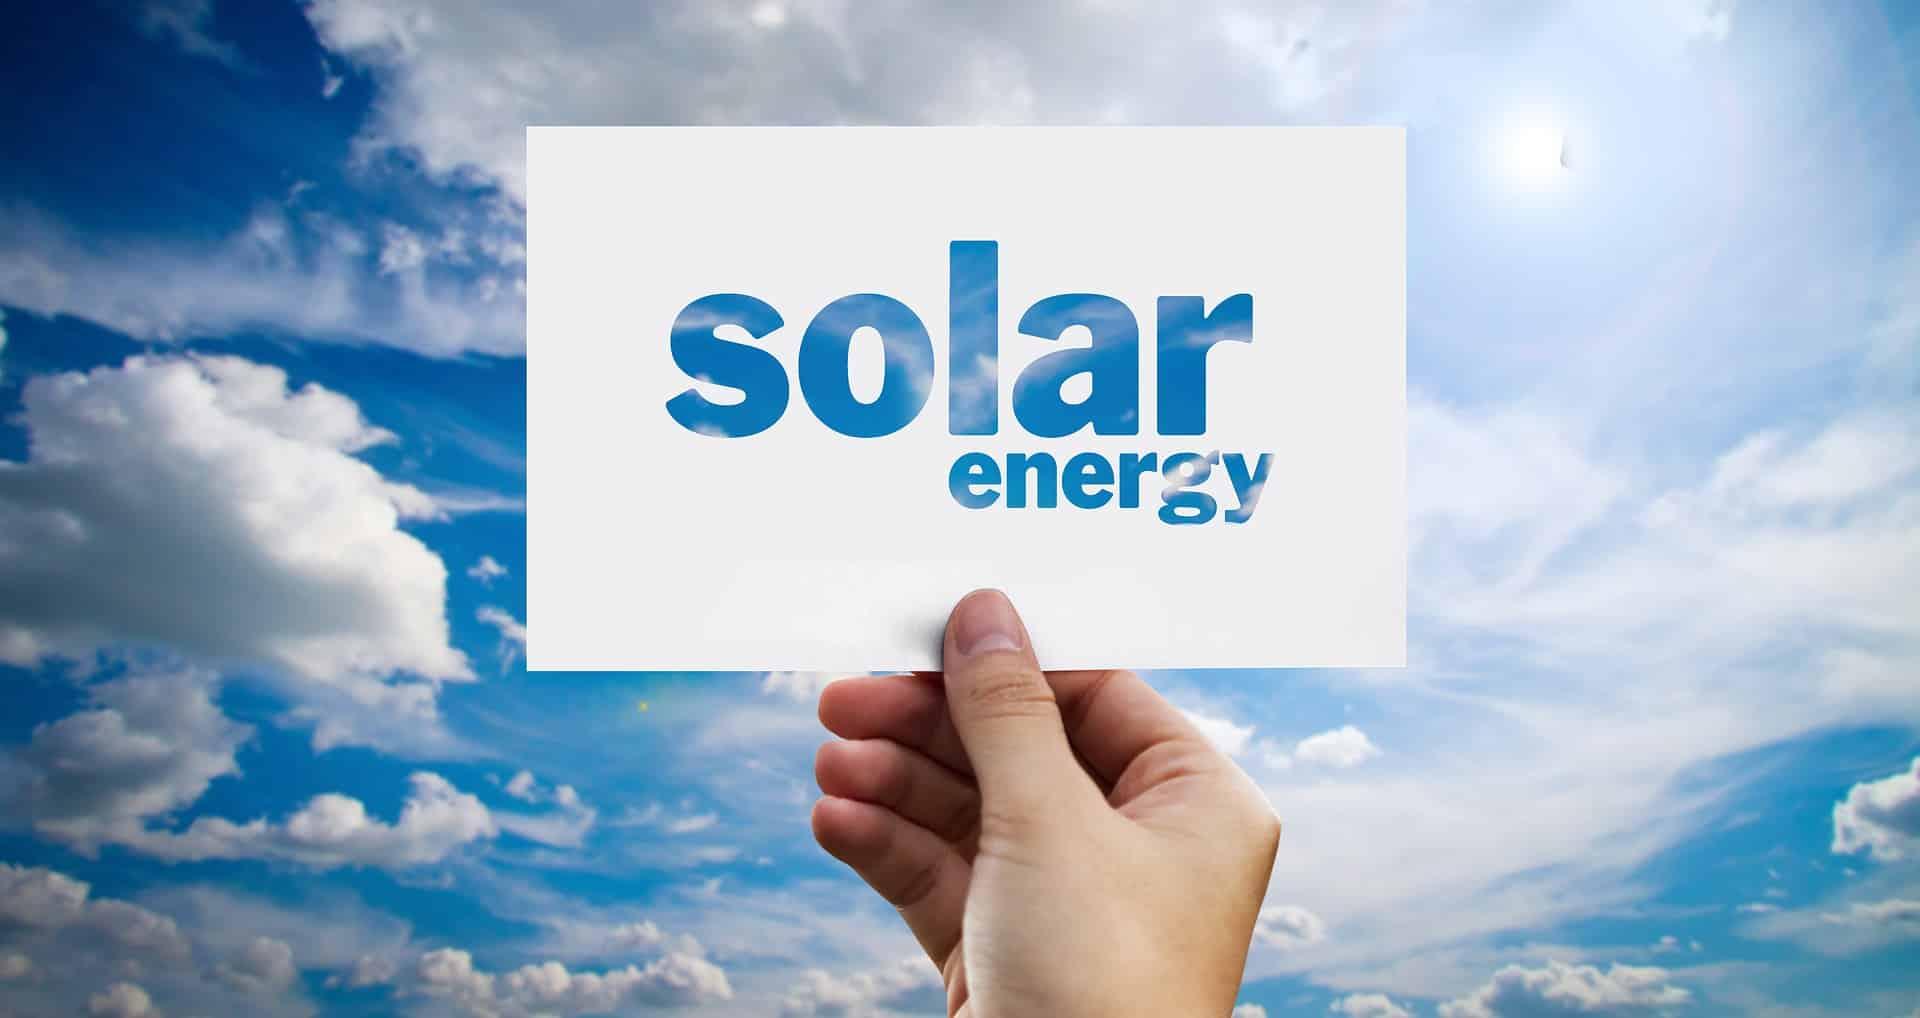 En hånd der holder et skilt, hvor der står solar energy på en blå himmel med lidt skyer